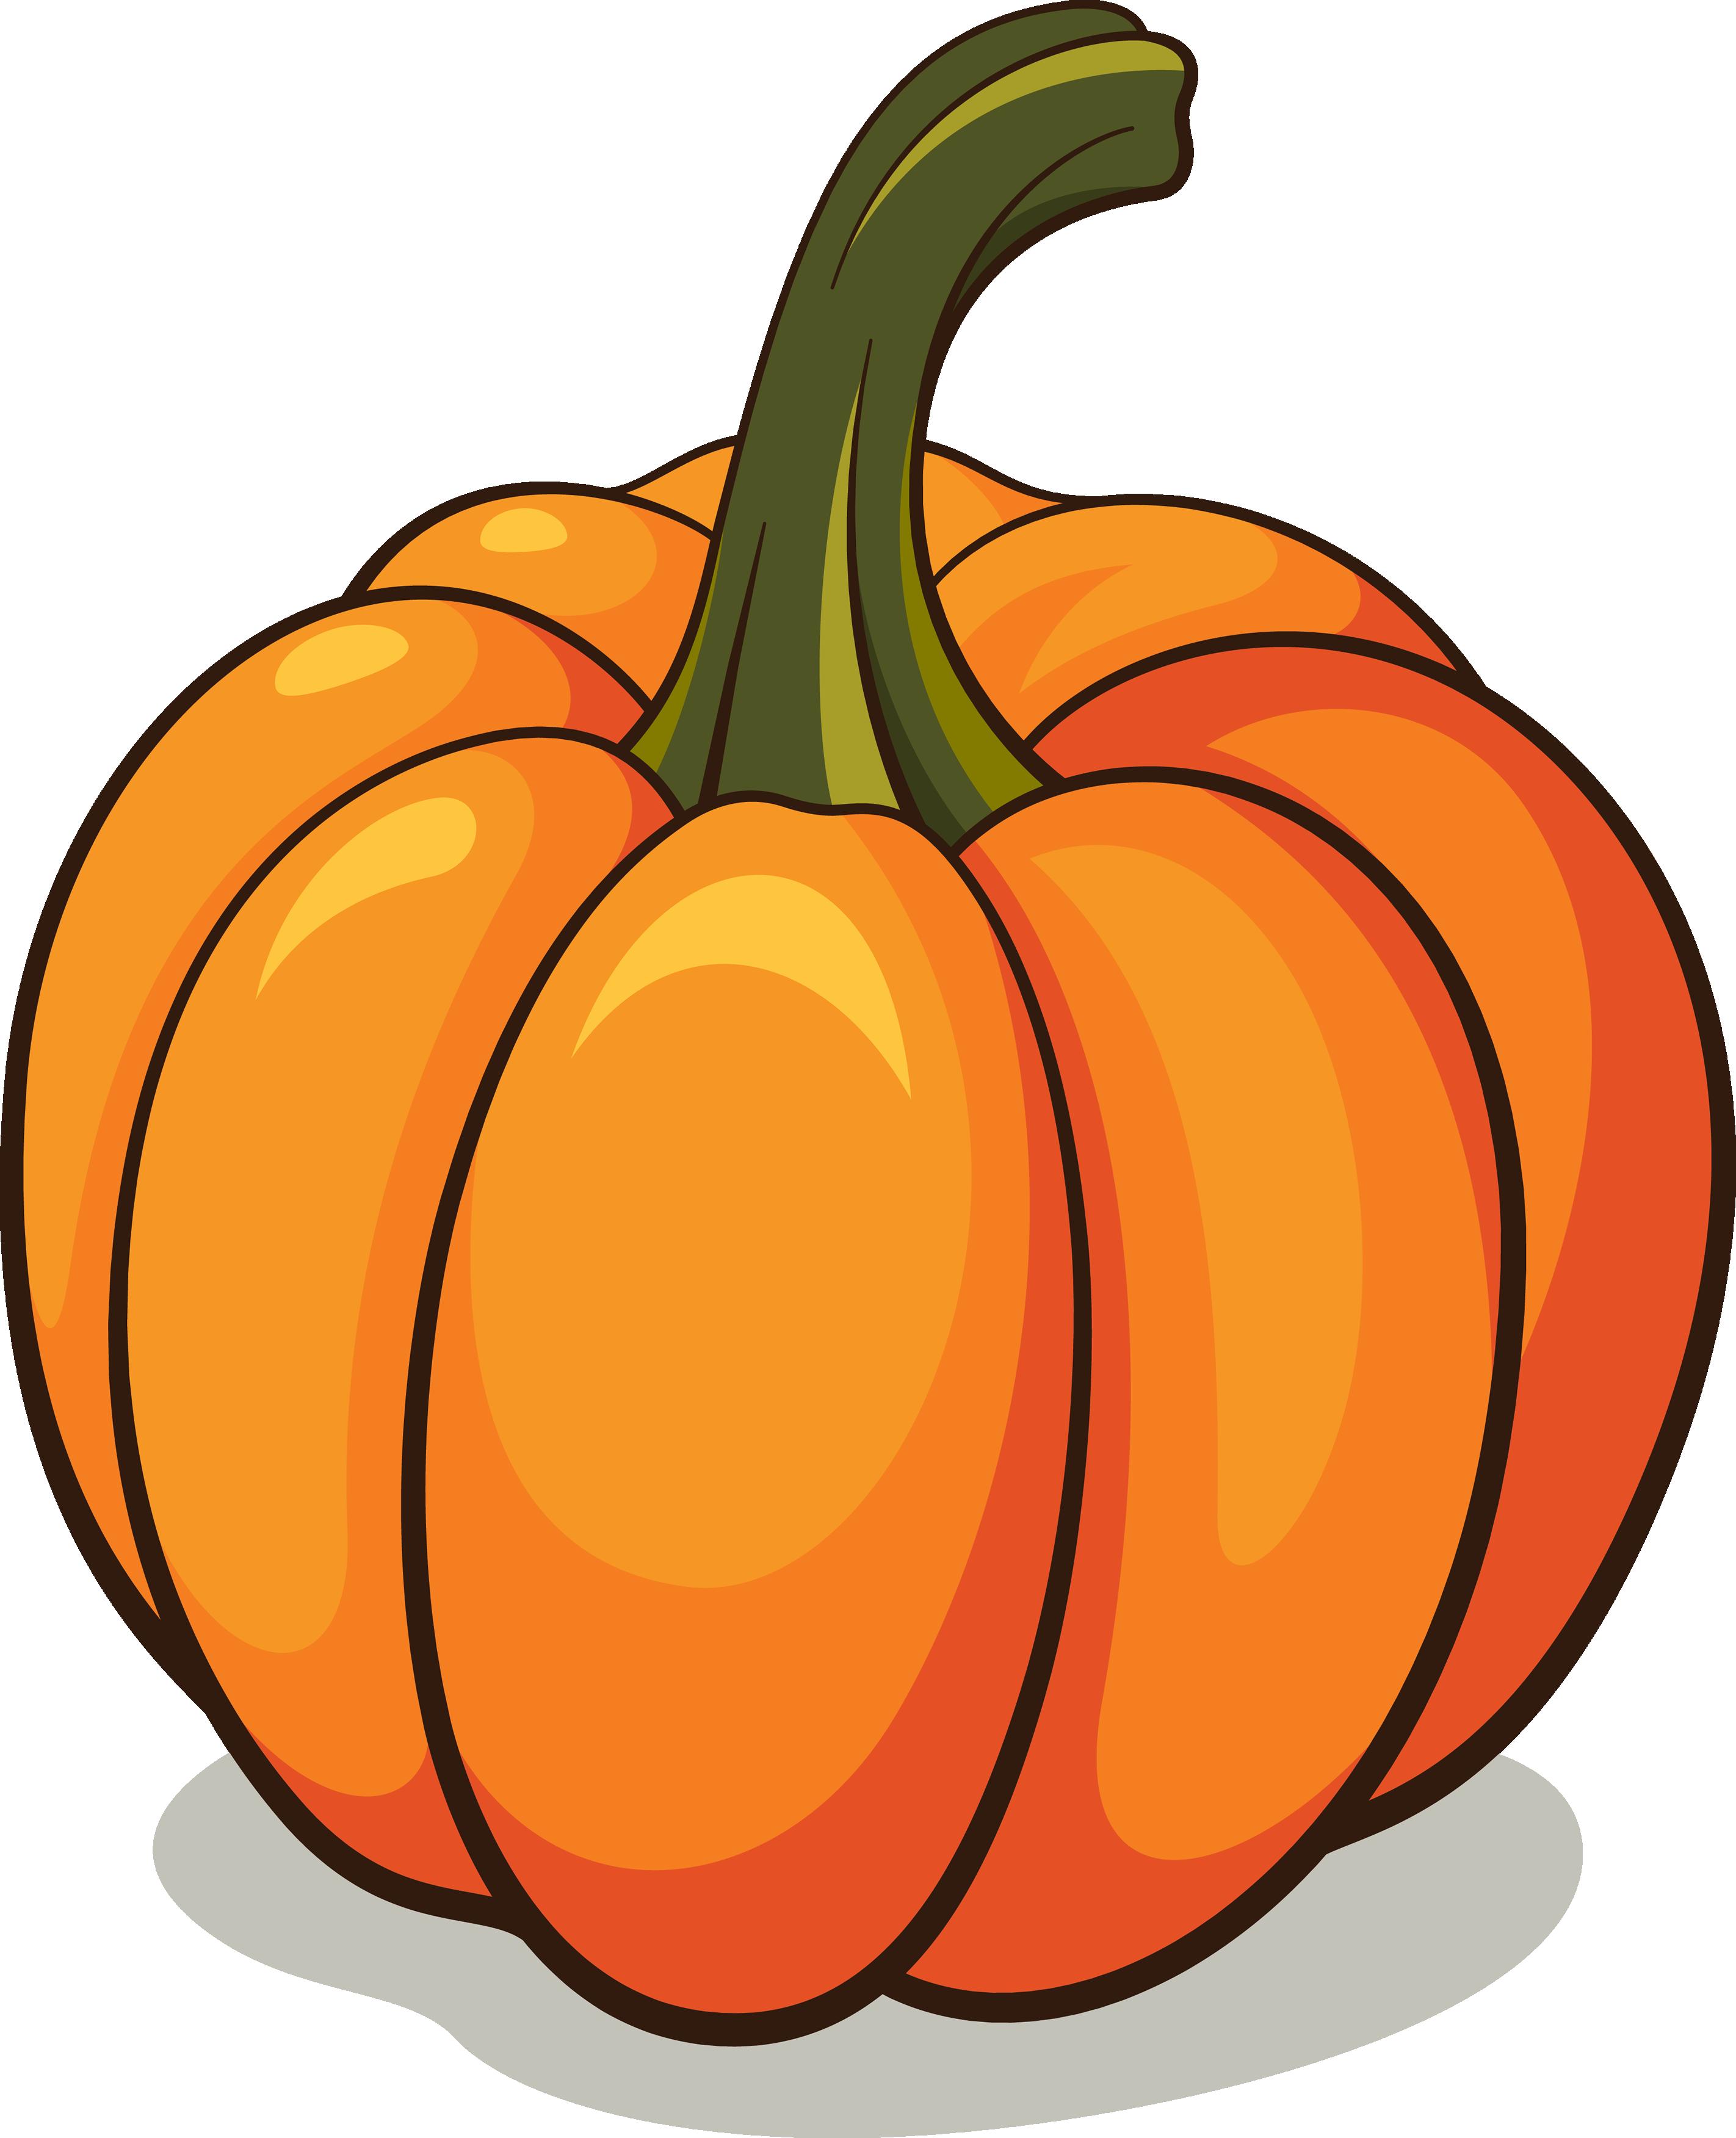 2844x3503 Pumpkin Clipart Biezumd